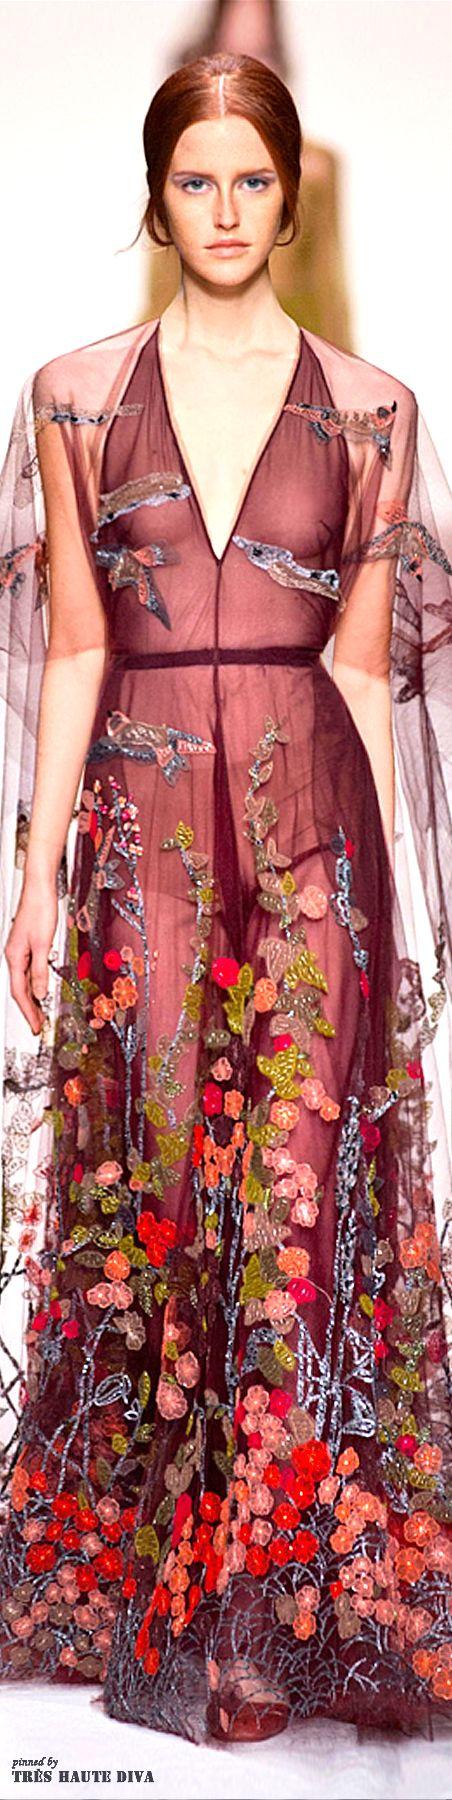 Paris Fashion Week Valentino Fall 2014 | The House of Beccaria~